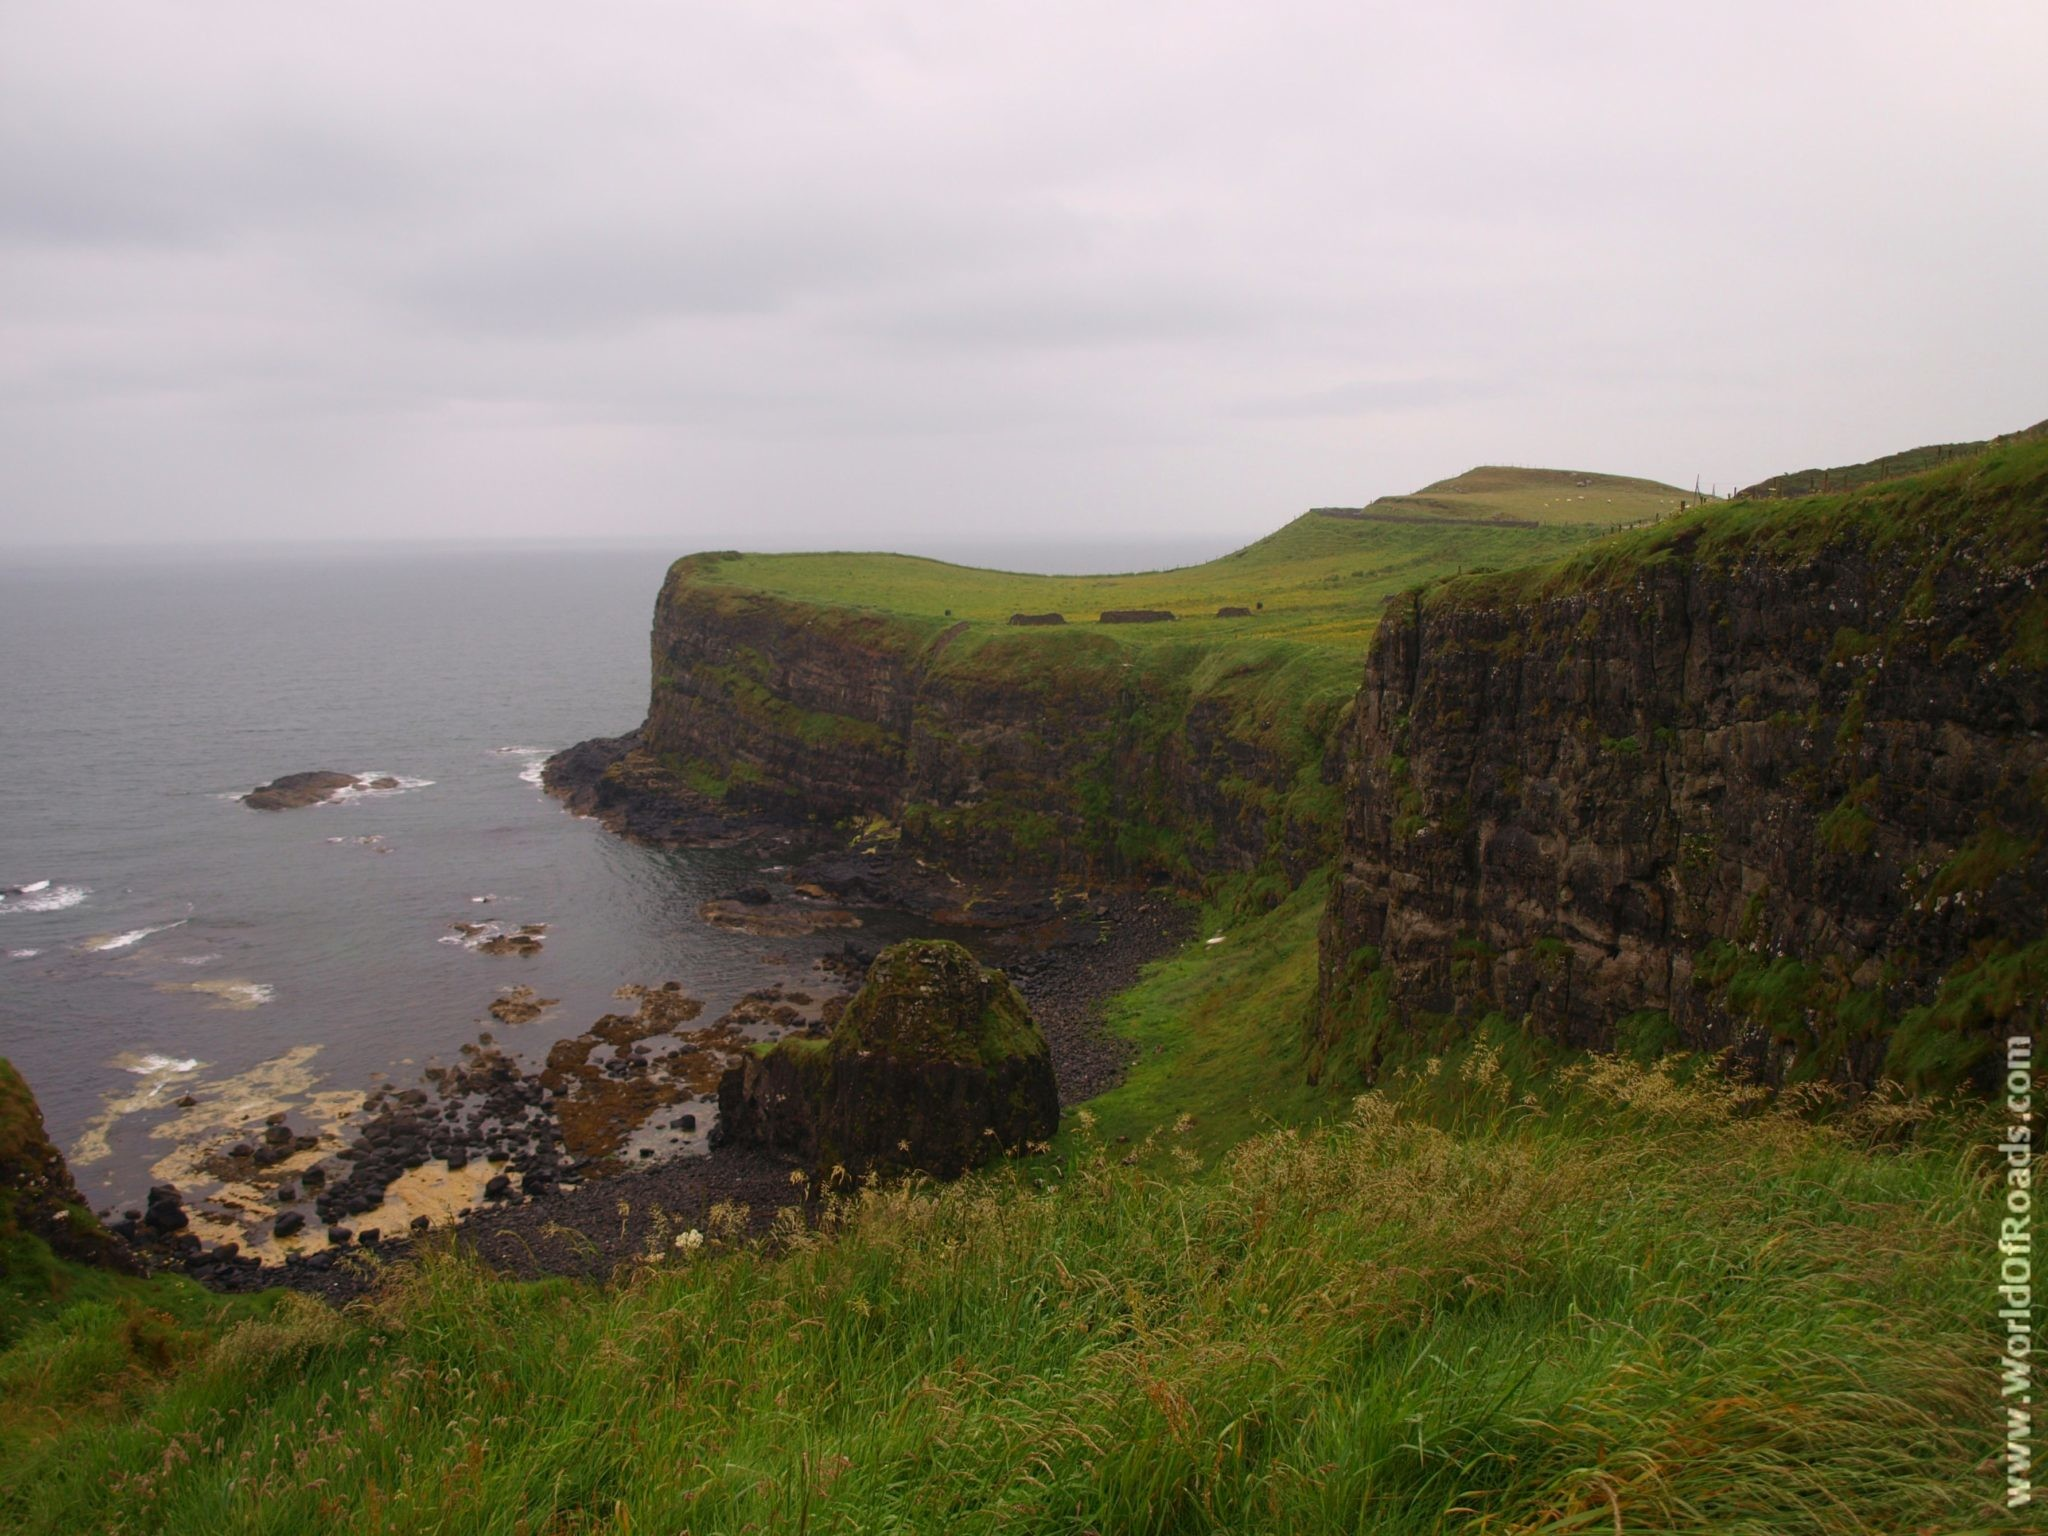 Замок Данлюс (Dunluce Castle). Северная Ирландия.